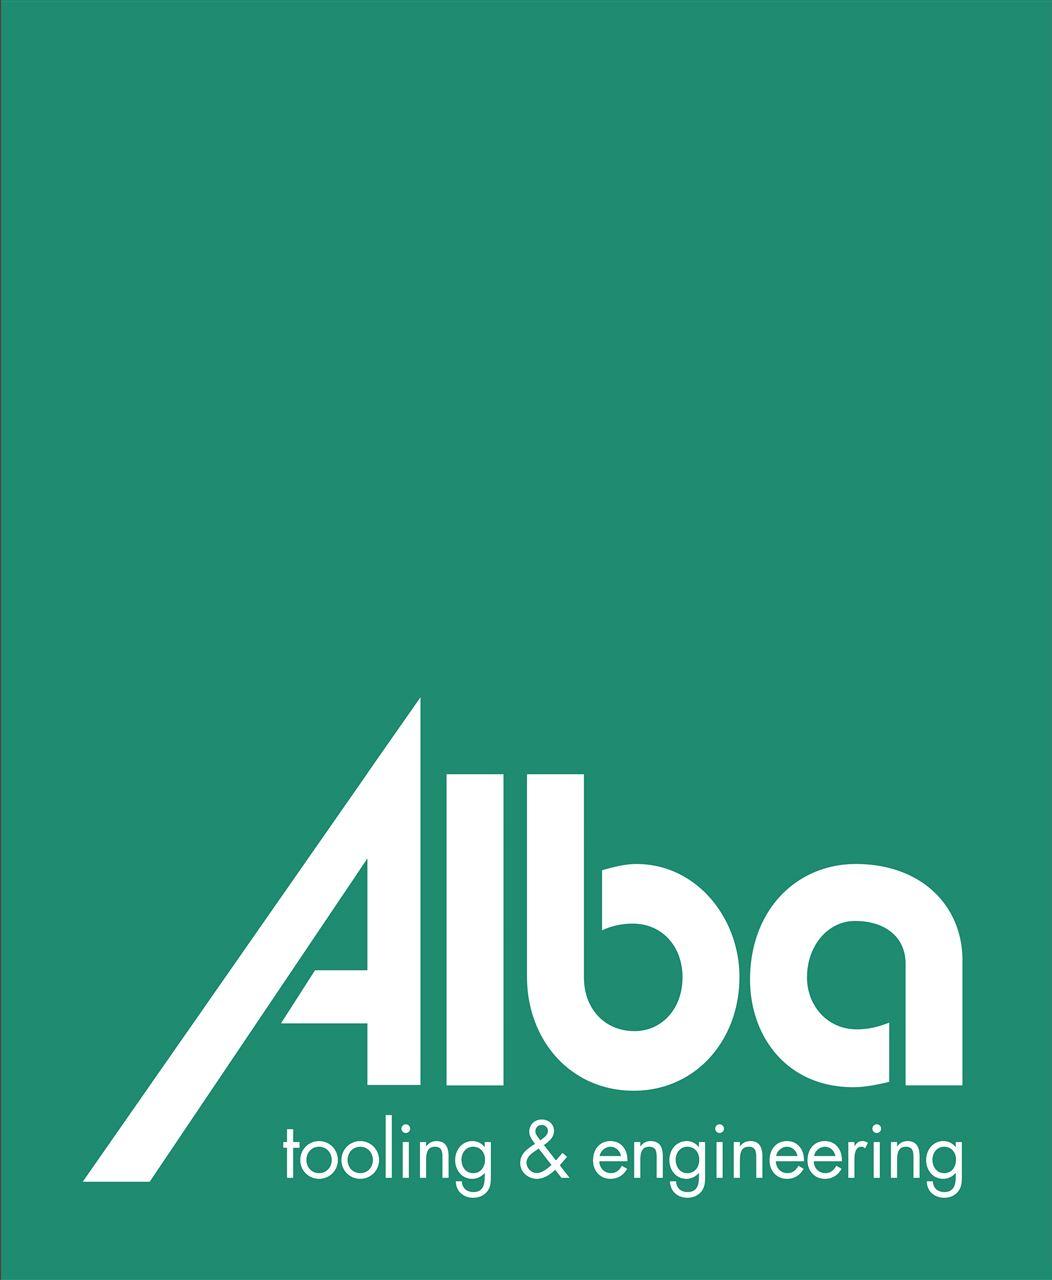 Alba tooling & engineering